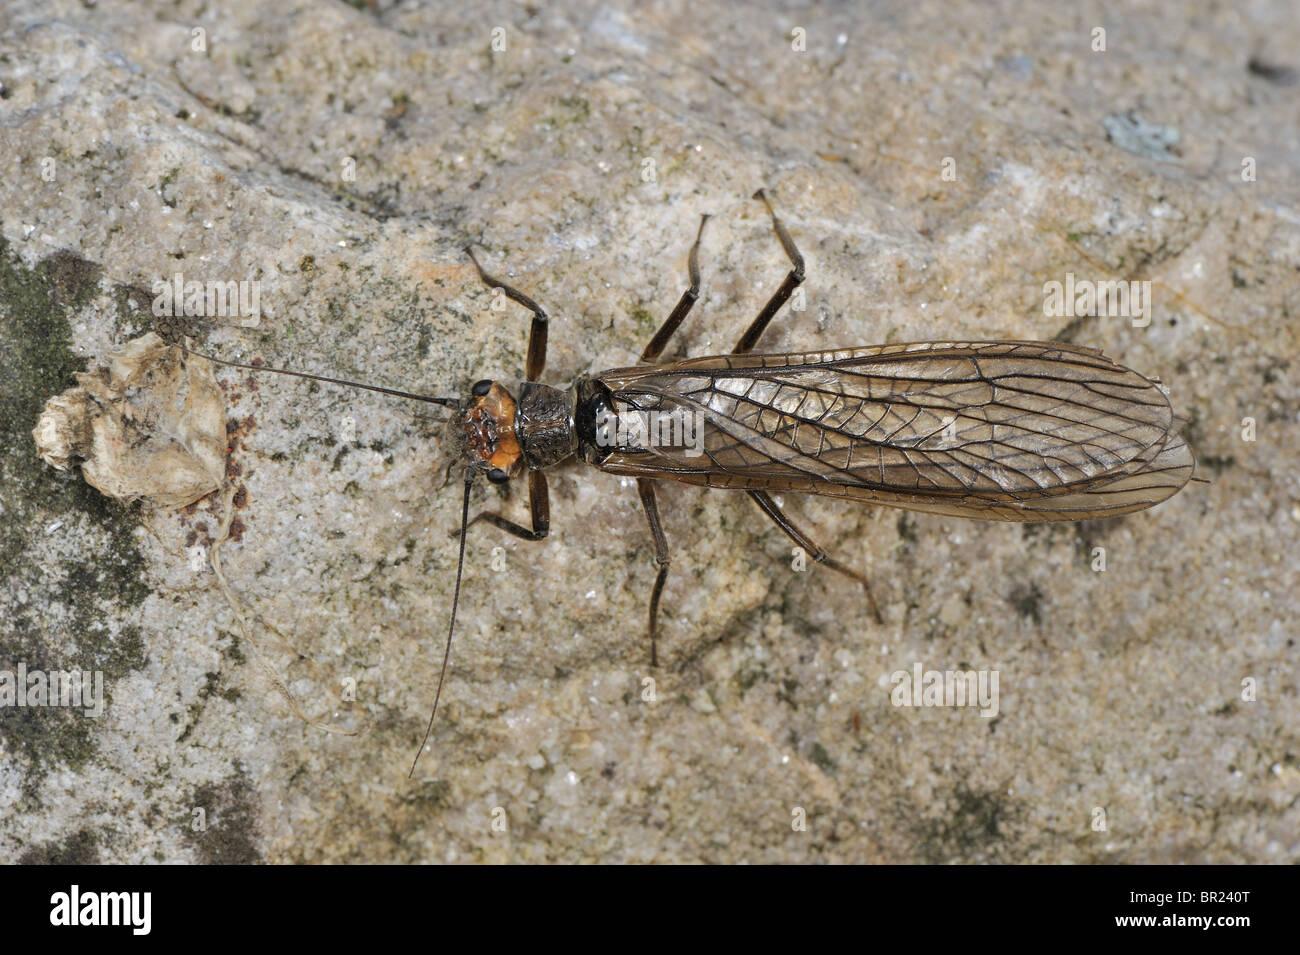 Stonefly (Perla marginata) - female on a rock near a river - Cevennes - France - Stock Image